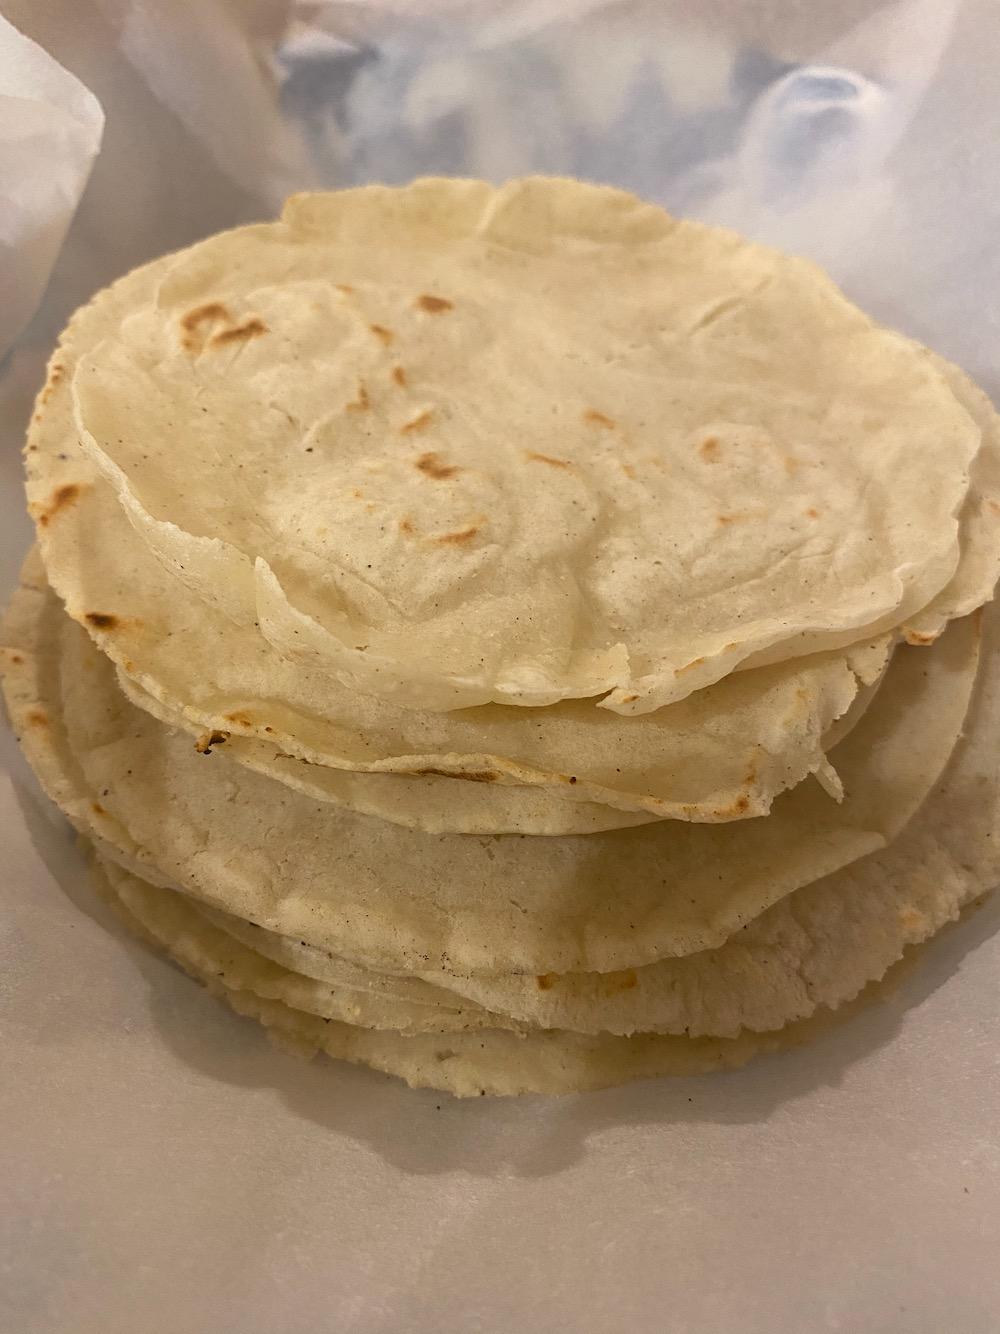 Homemade corn tortillas!